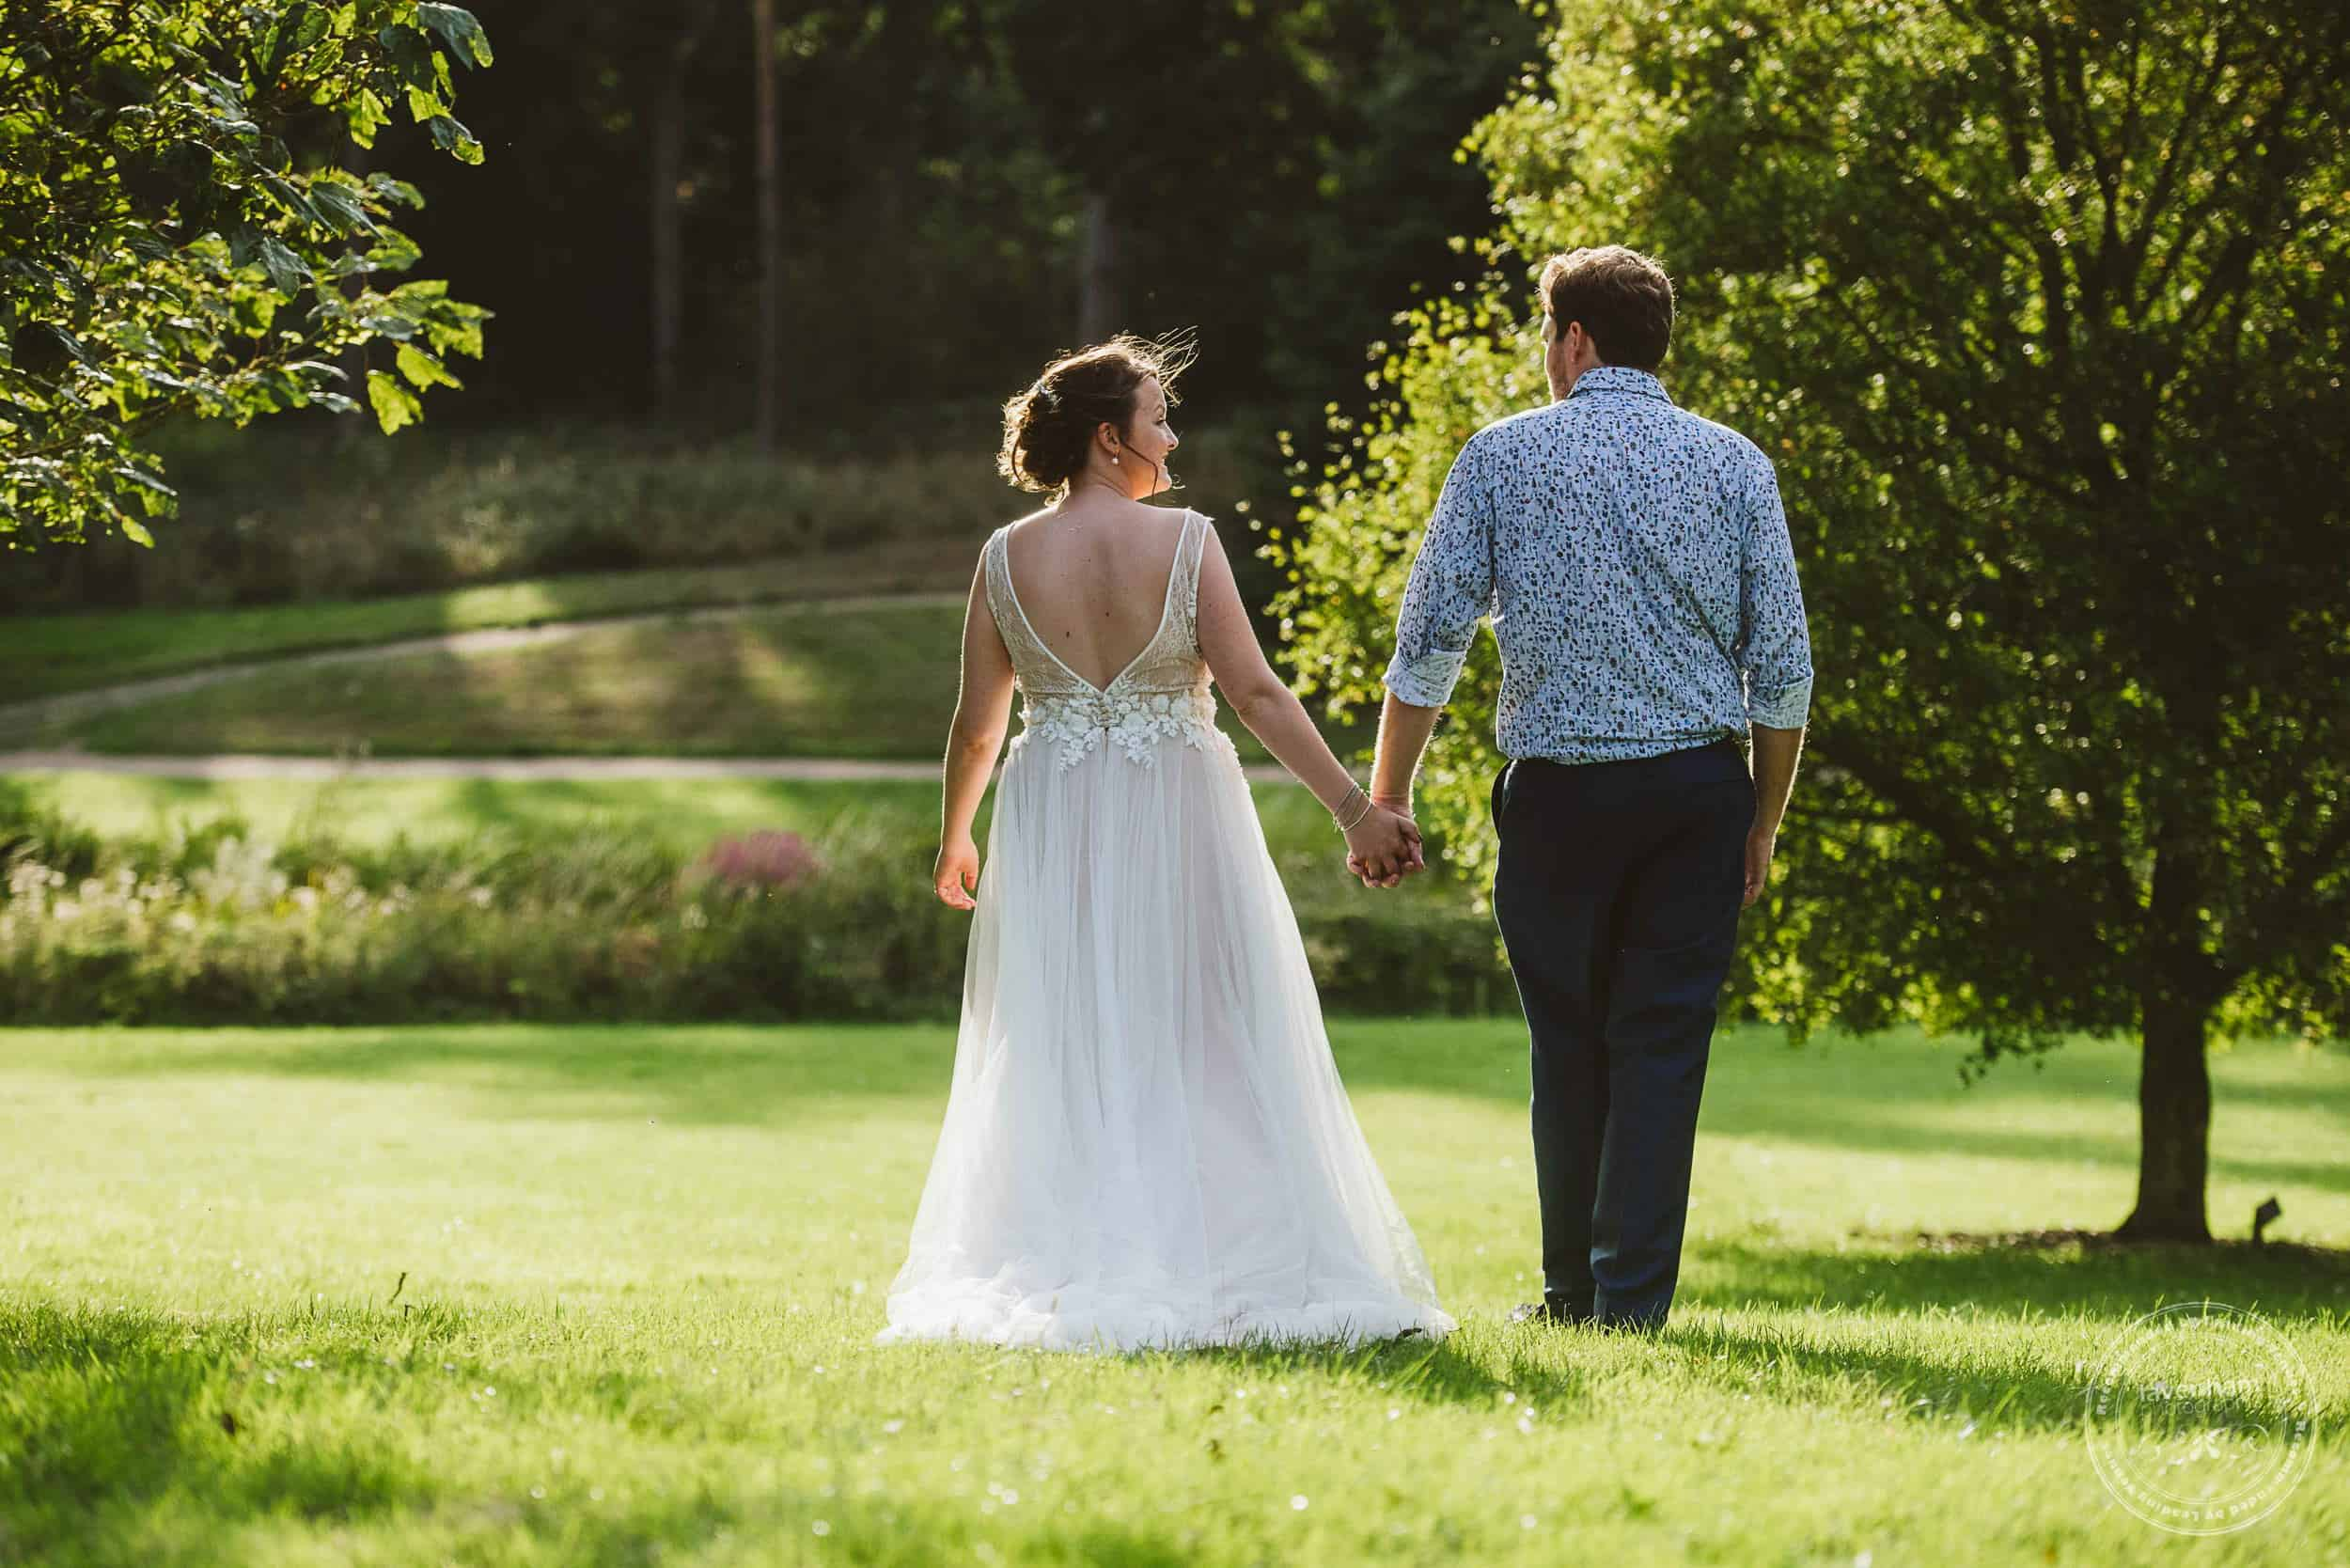 180818 Marks Hall Wedding Photography Lavenham Photographic 129